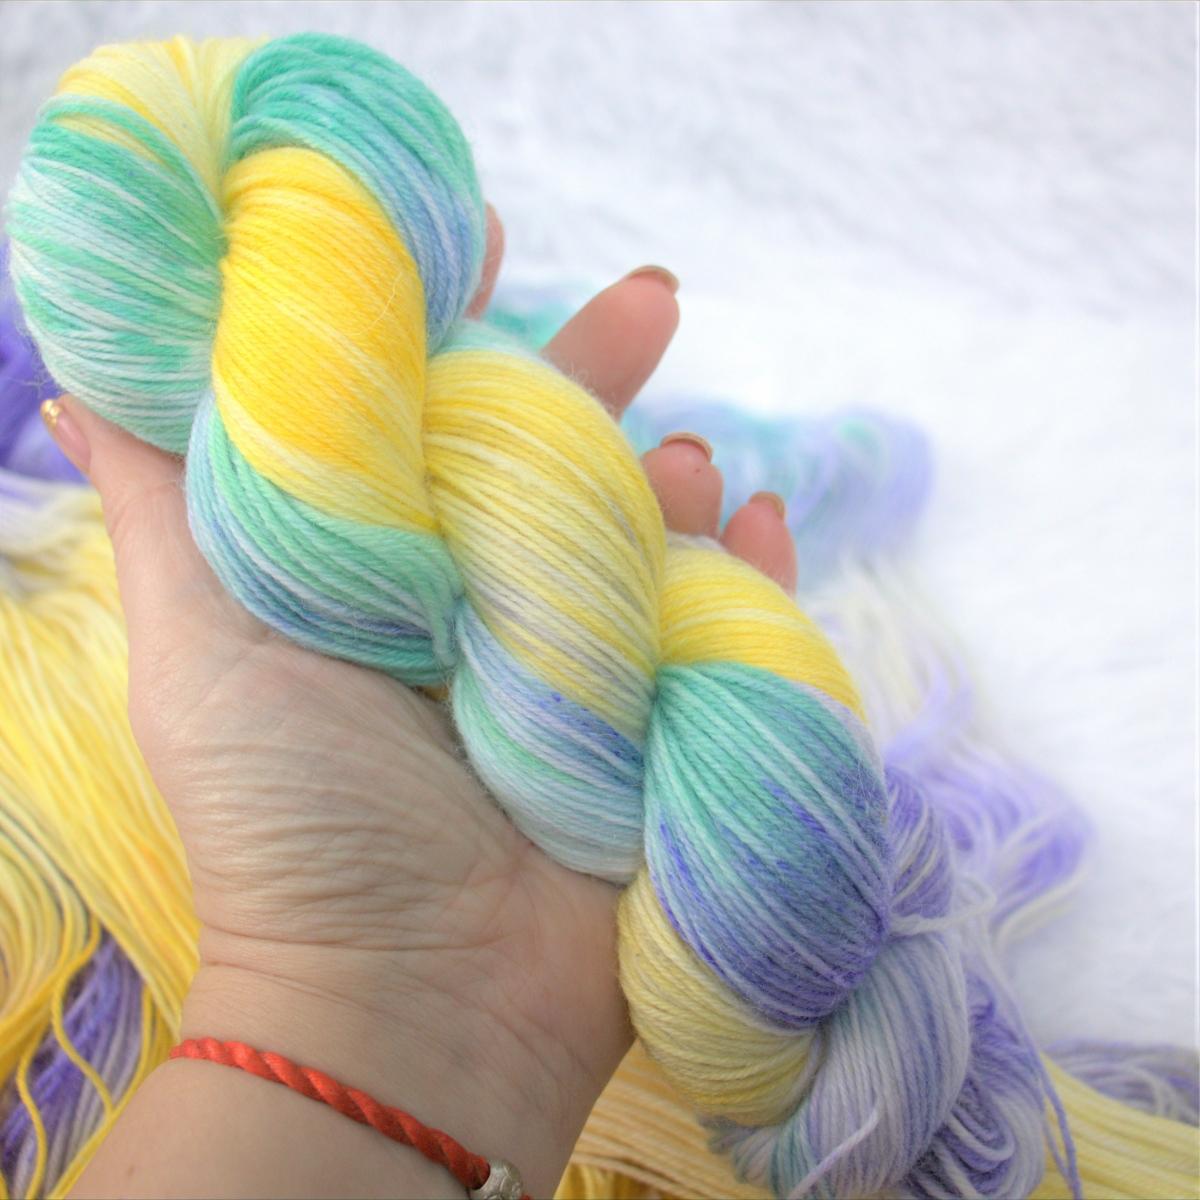 woodico.pro hand dyed yarn 045 copy 2 1200x1200 - Hand dyed yarn / 046